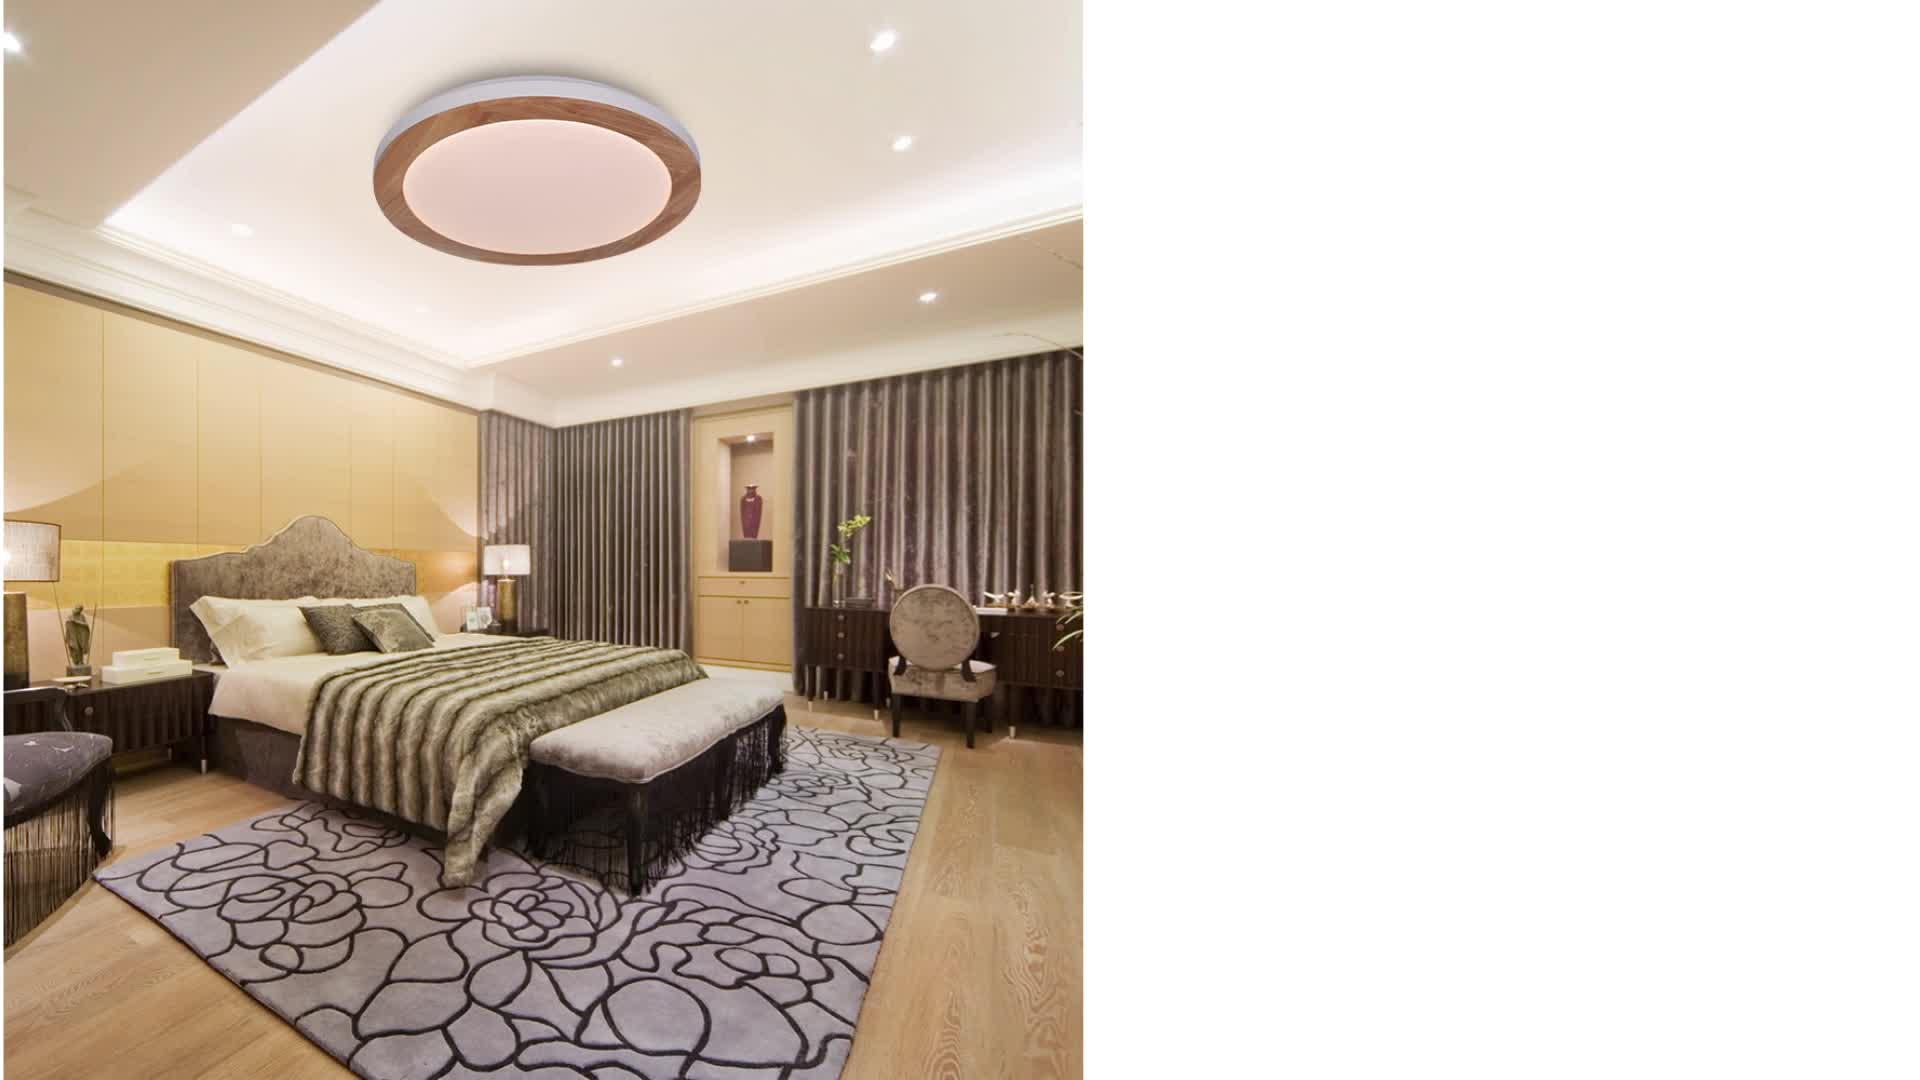 Wood Plafonnier Aux Del Classic Tuya APP Control LED Ceiling Lights Wireless Lamparas De Techo Customized RGB LED Ceiling Lamp